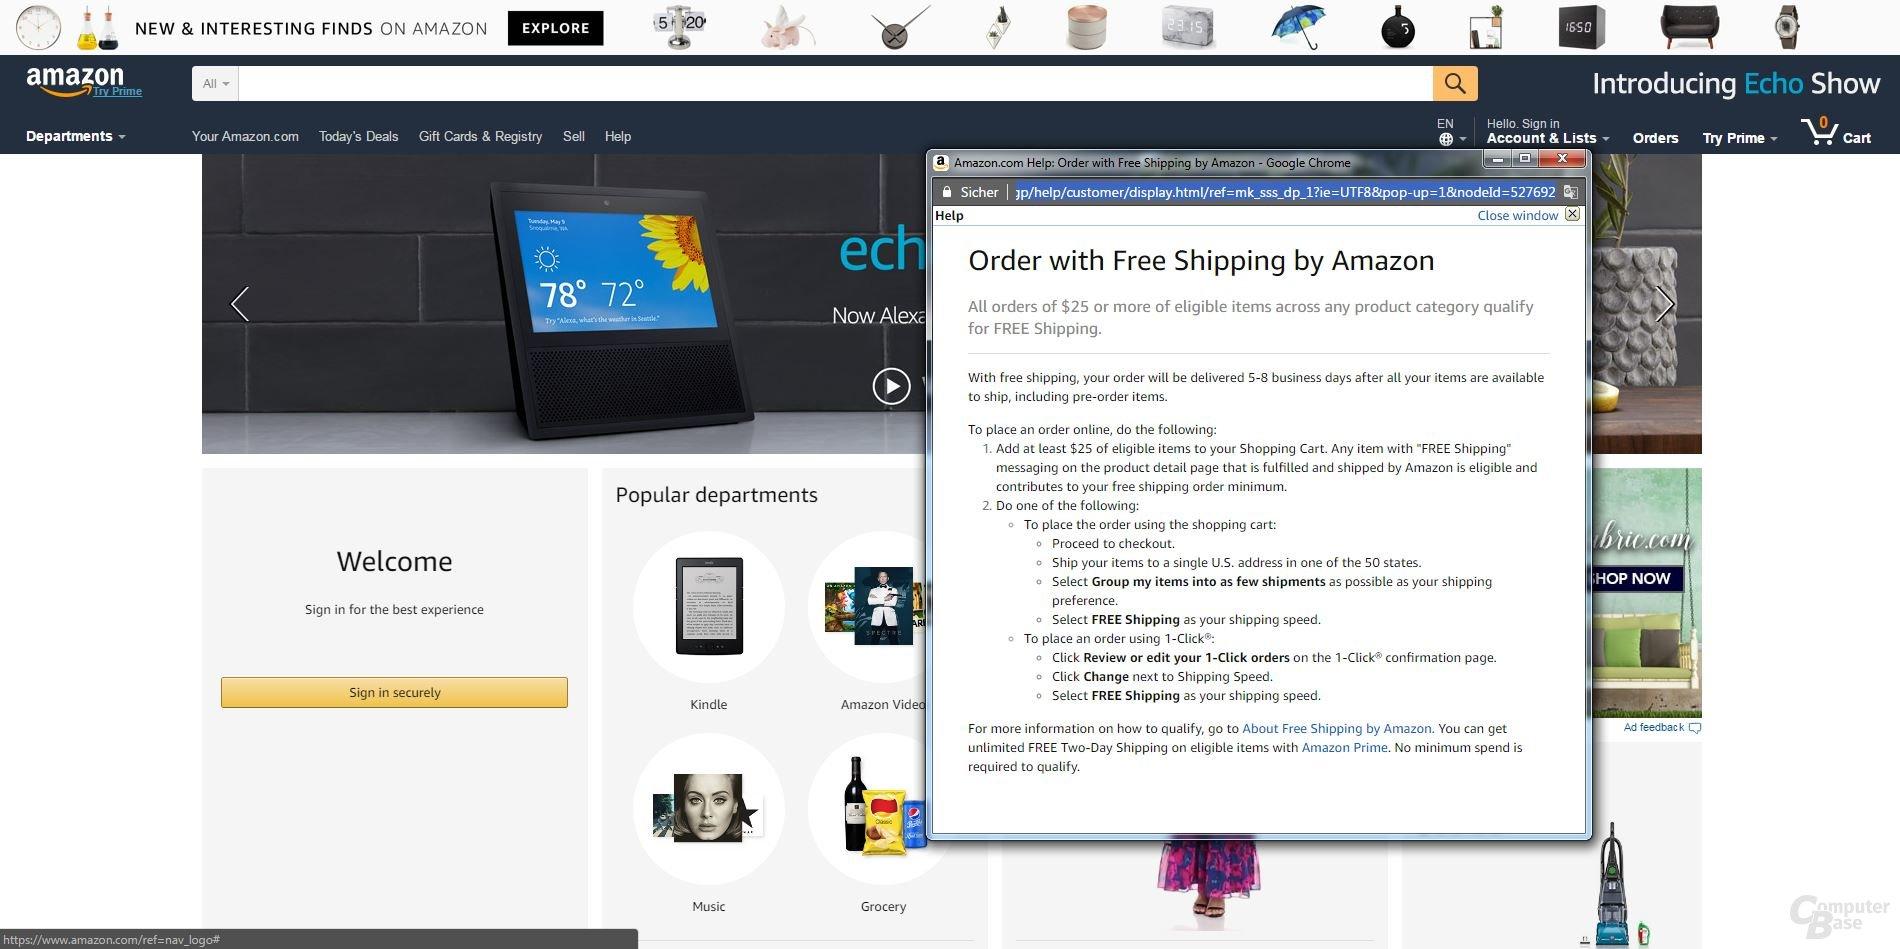 Amazon.com Mindestbestellwert 25 Dollar